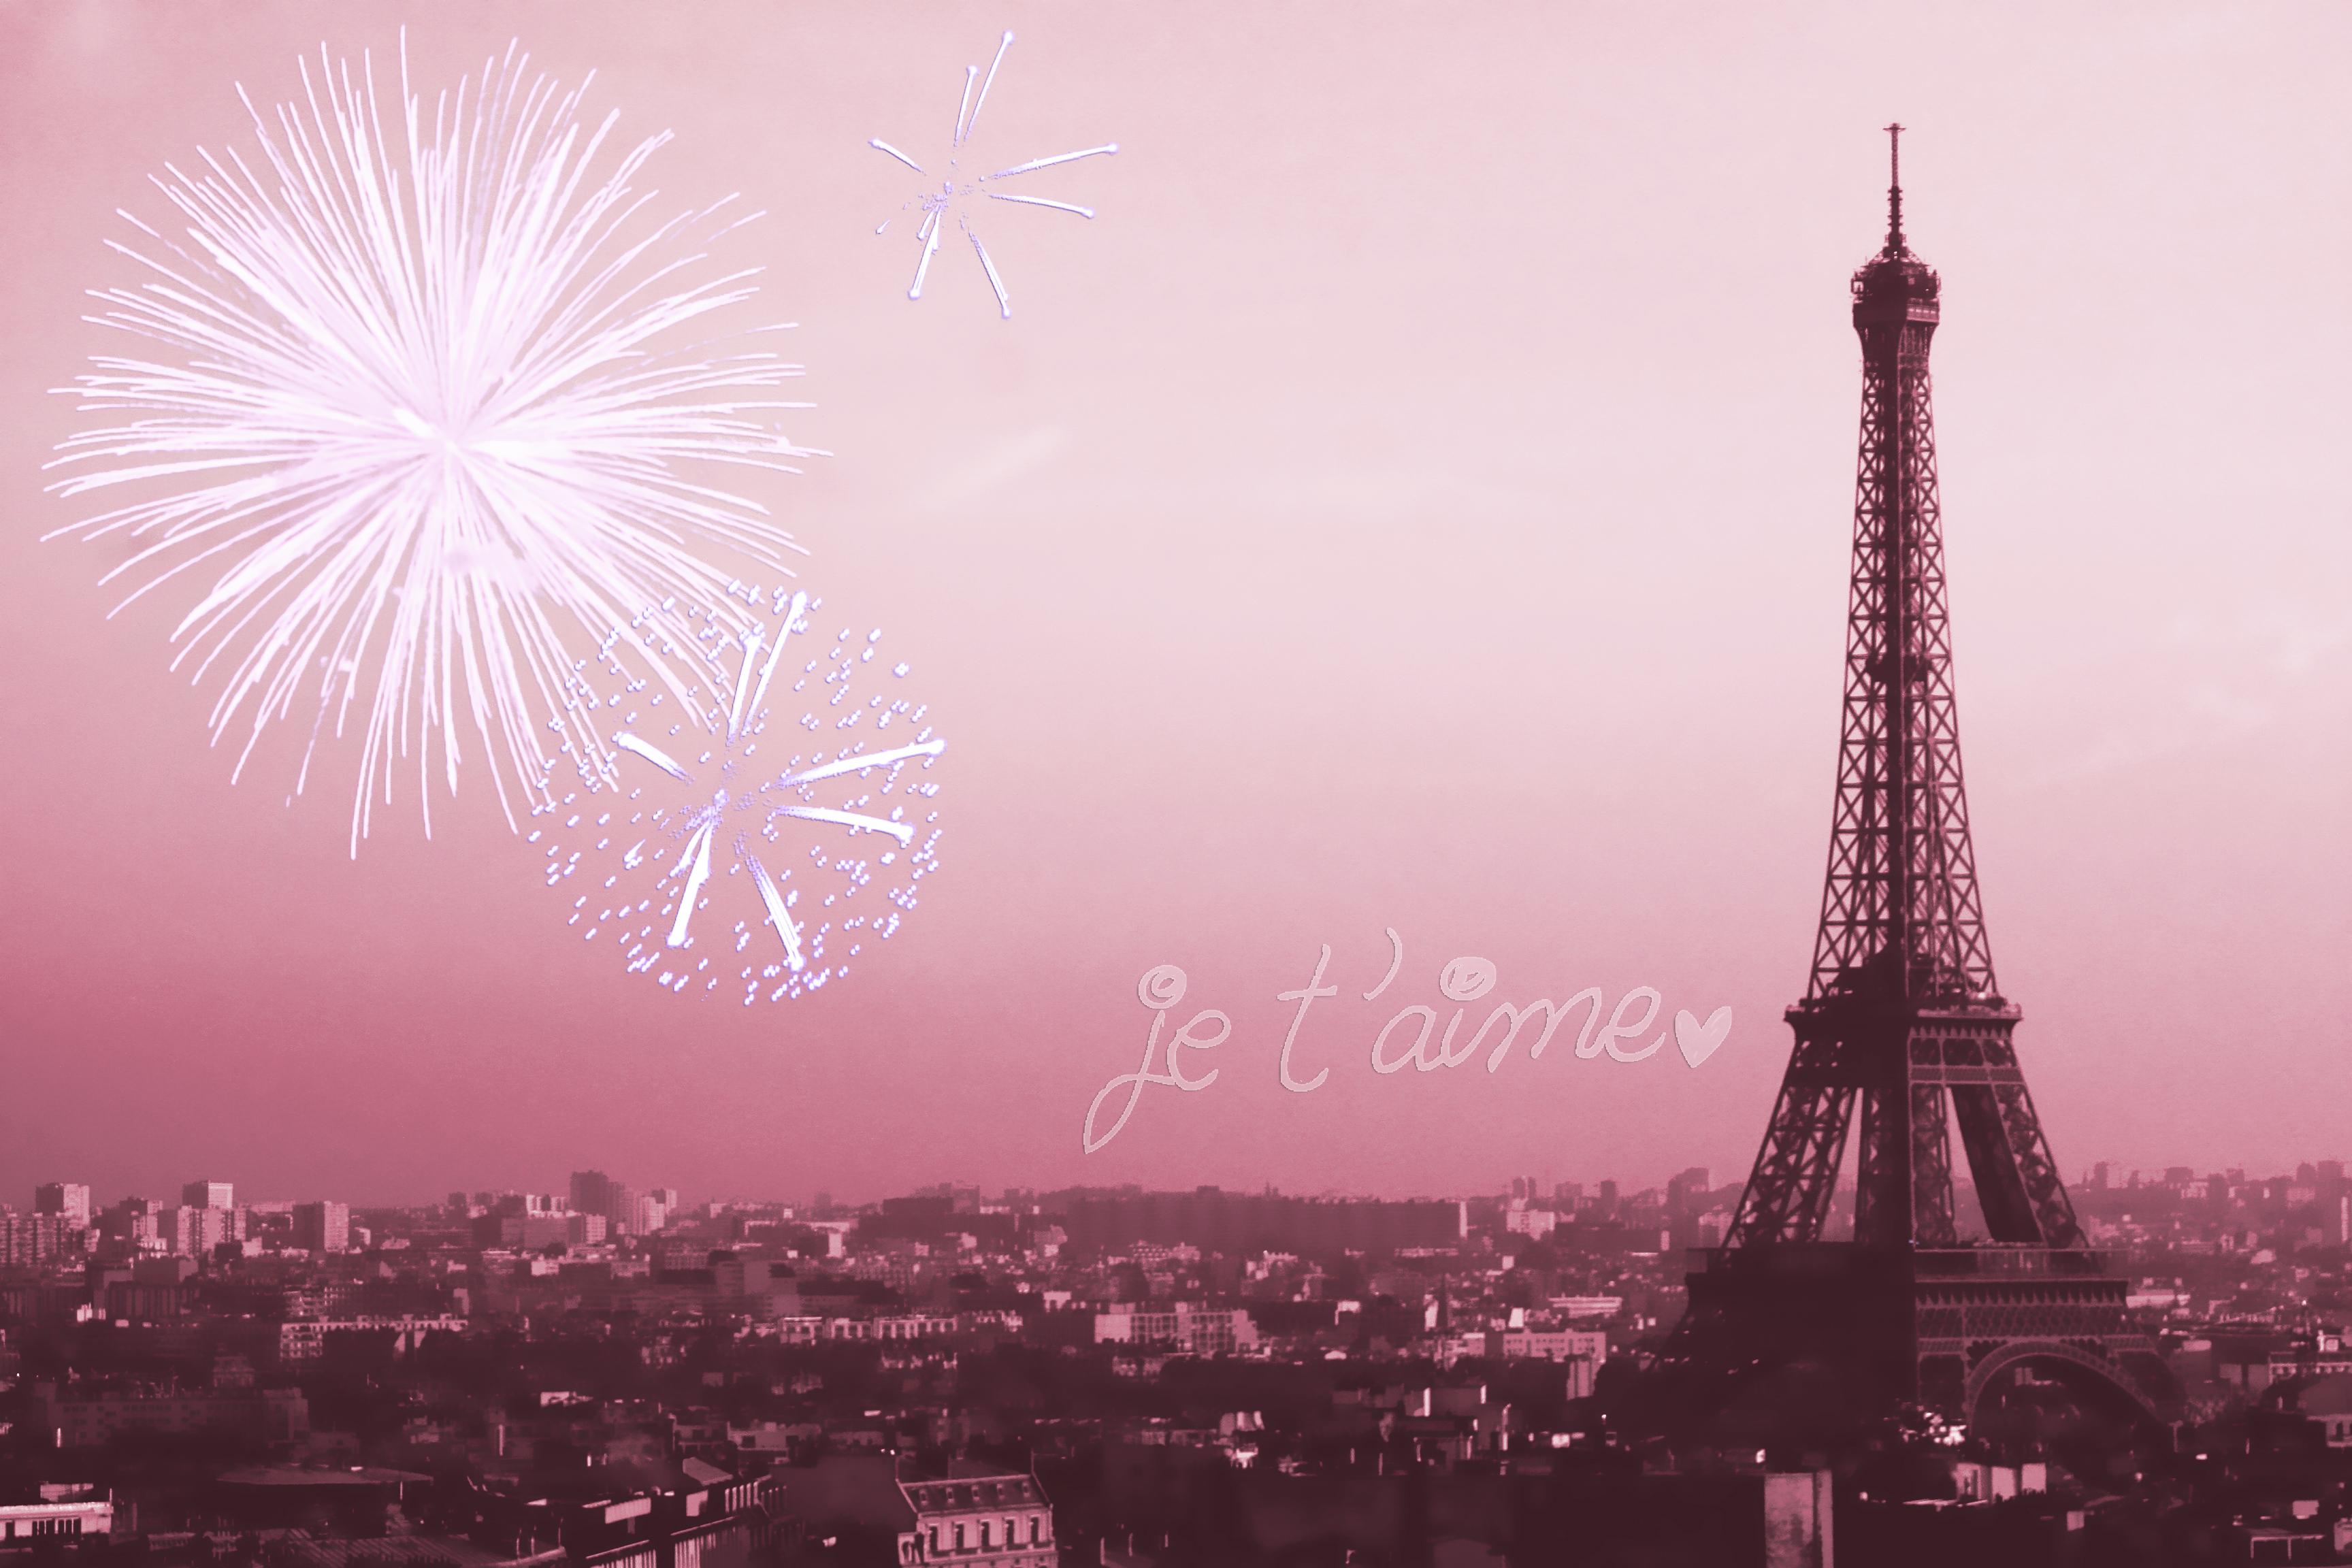 wallpaper paris cute 621 pink paris wallpaper 149 cute paris wallpaper 3456x2304